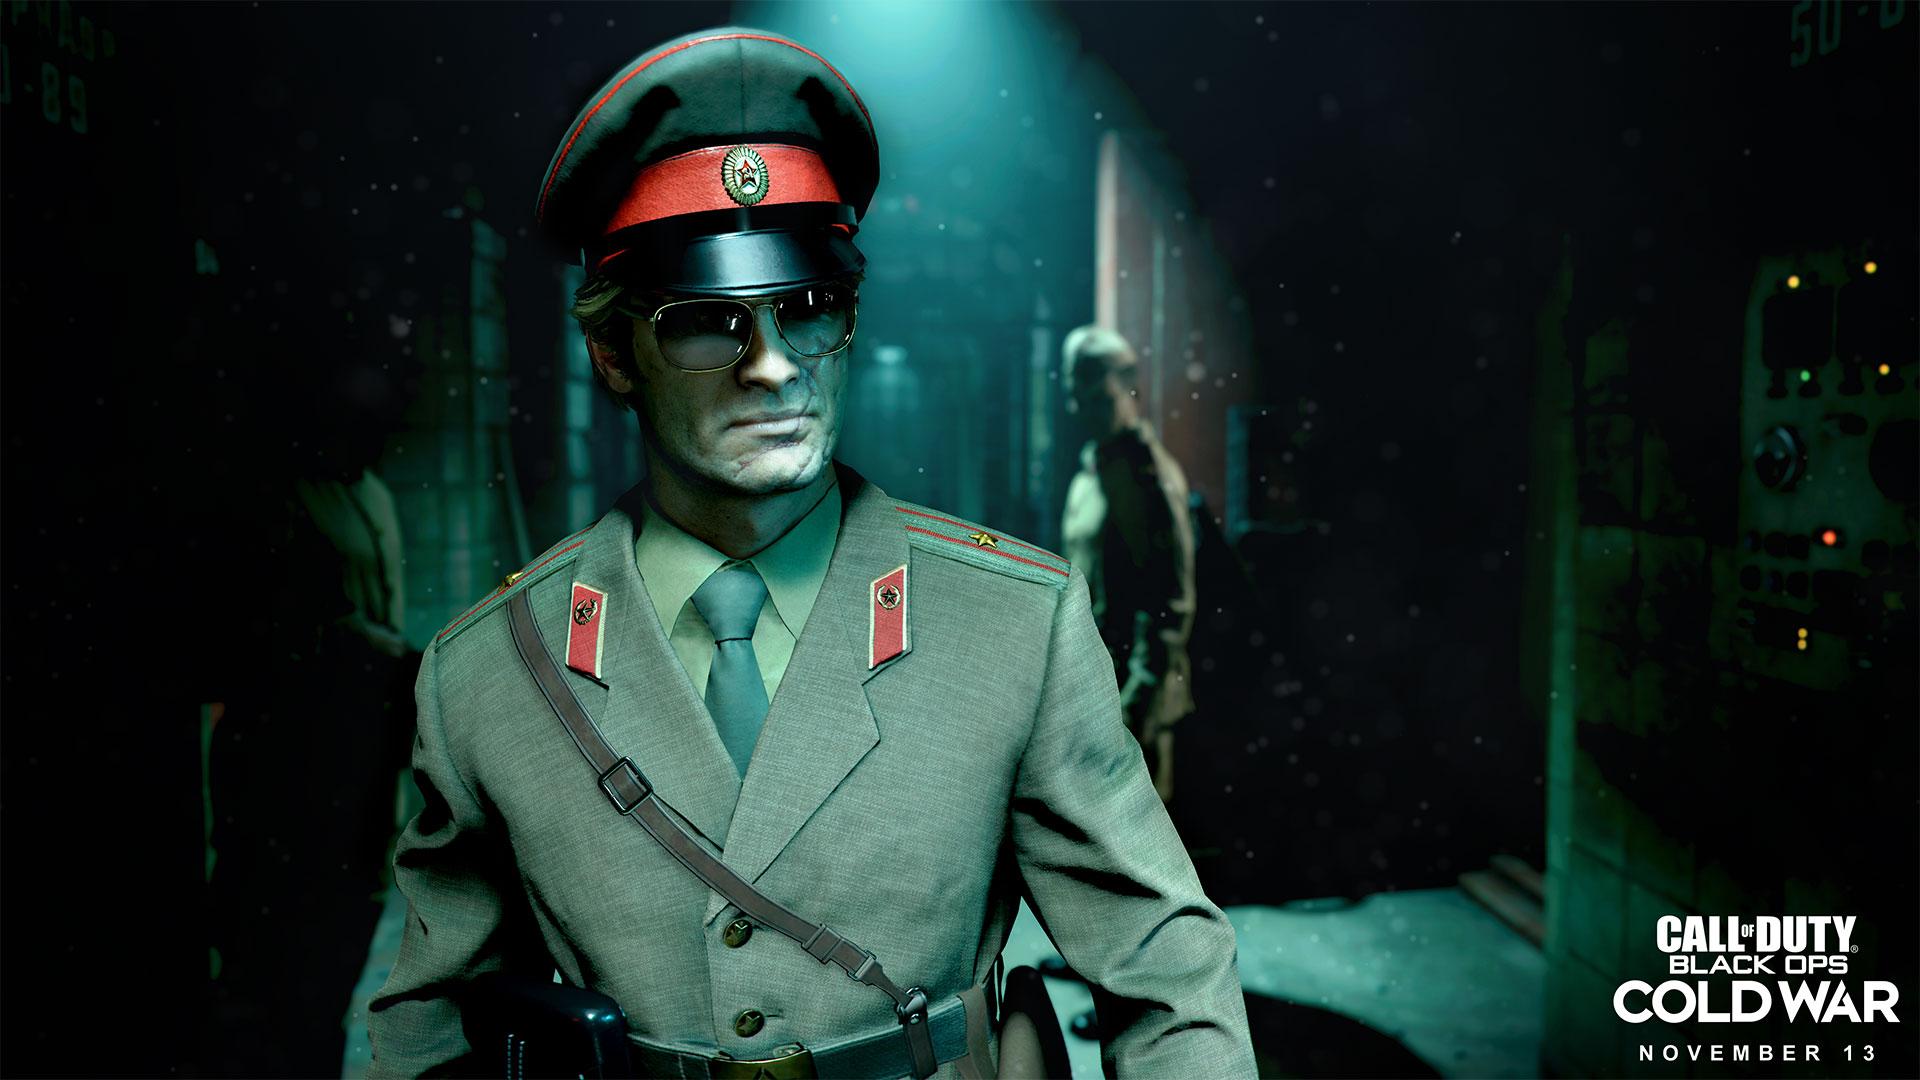 CoD Black Ops: Cold War Rilis Trailer Perdana, Sangat Menjanjikan